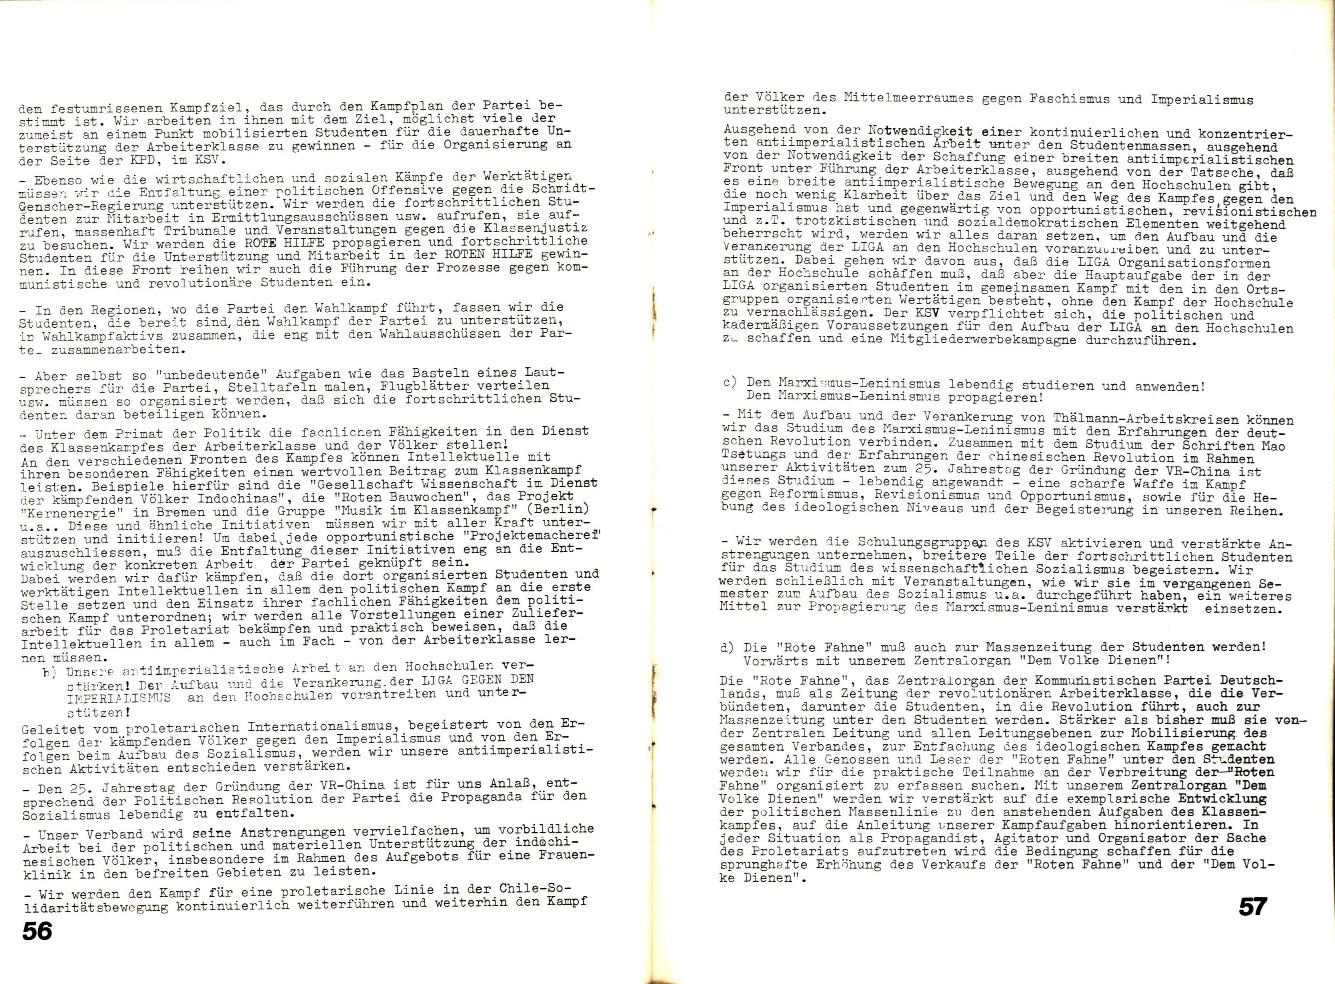 KSV_1974_Rechenschaftsbericht_30